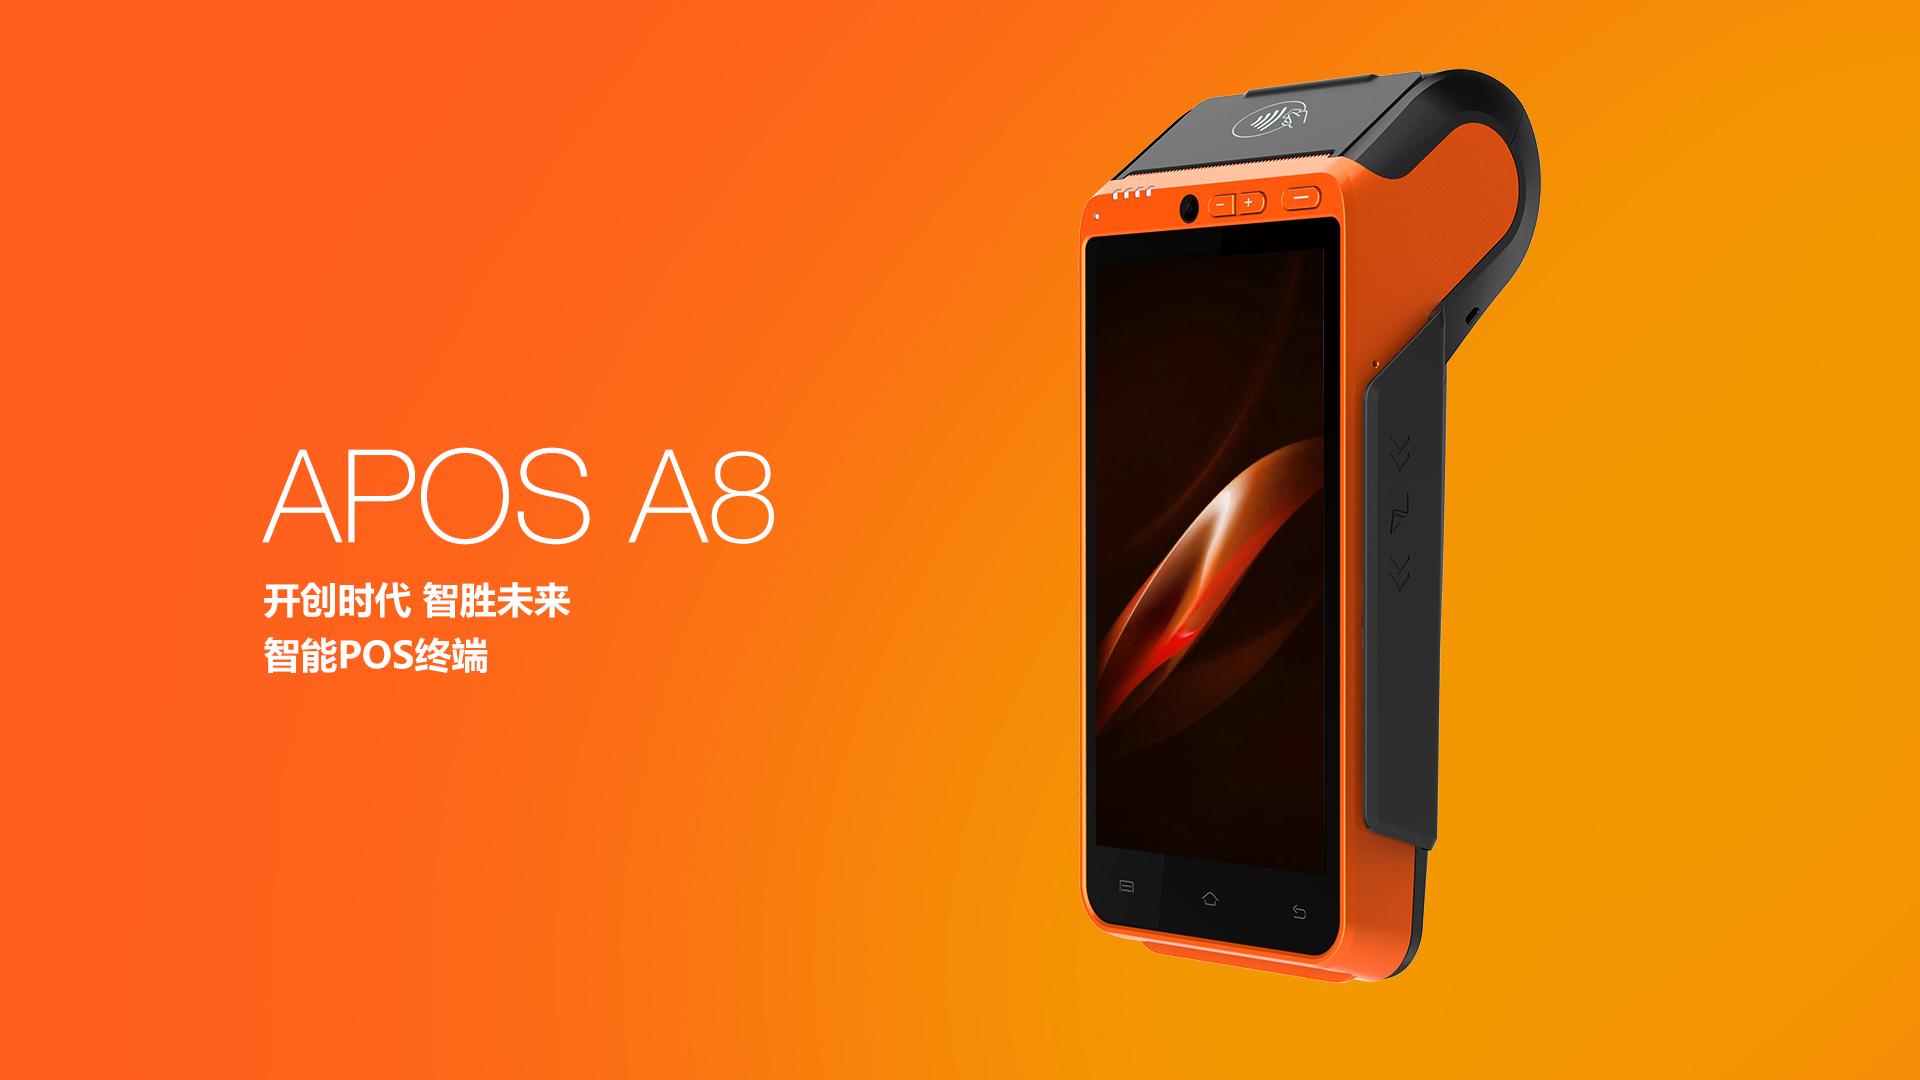 APOS A8 主效果图